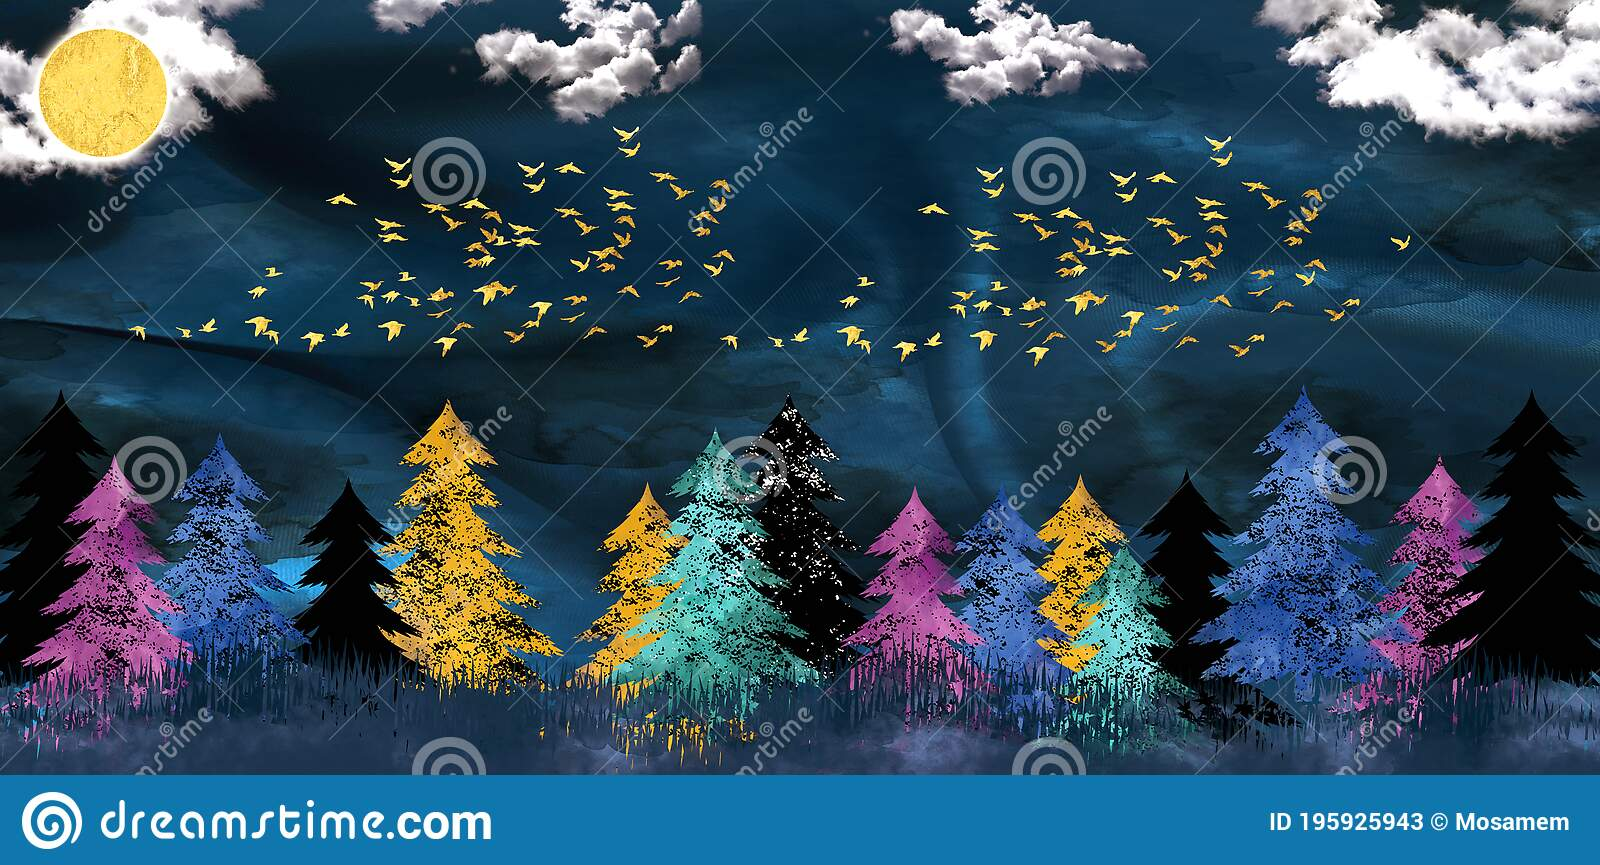 3d Modern Art Mural Wallpaper With Dark Blue Jungle Forest Dark Blue Background Black Christmas Tree Mountain Golden Moo Stock Illustration Illustration Of Antlers Design 195925943